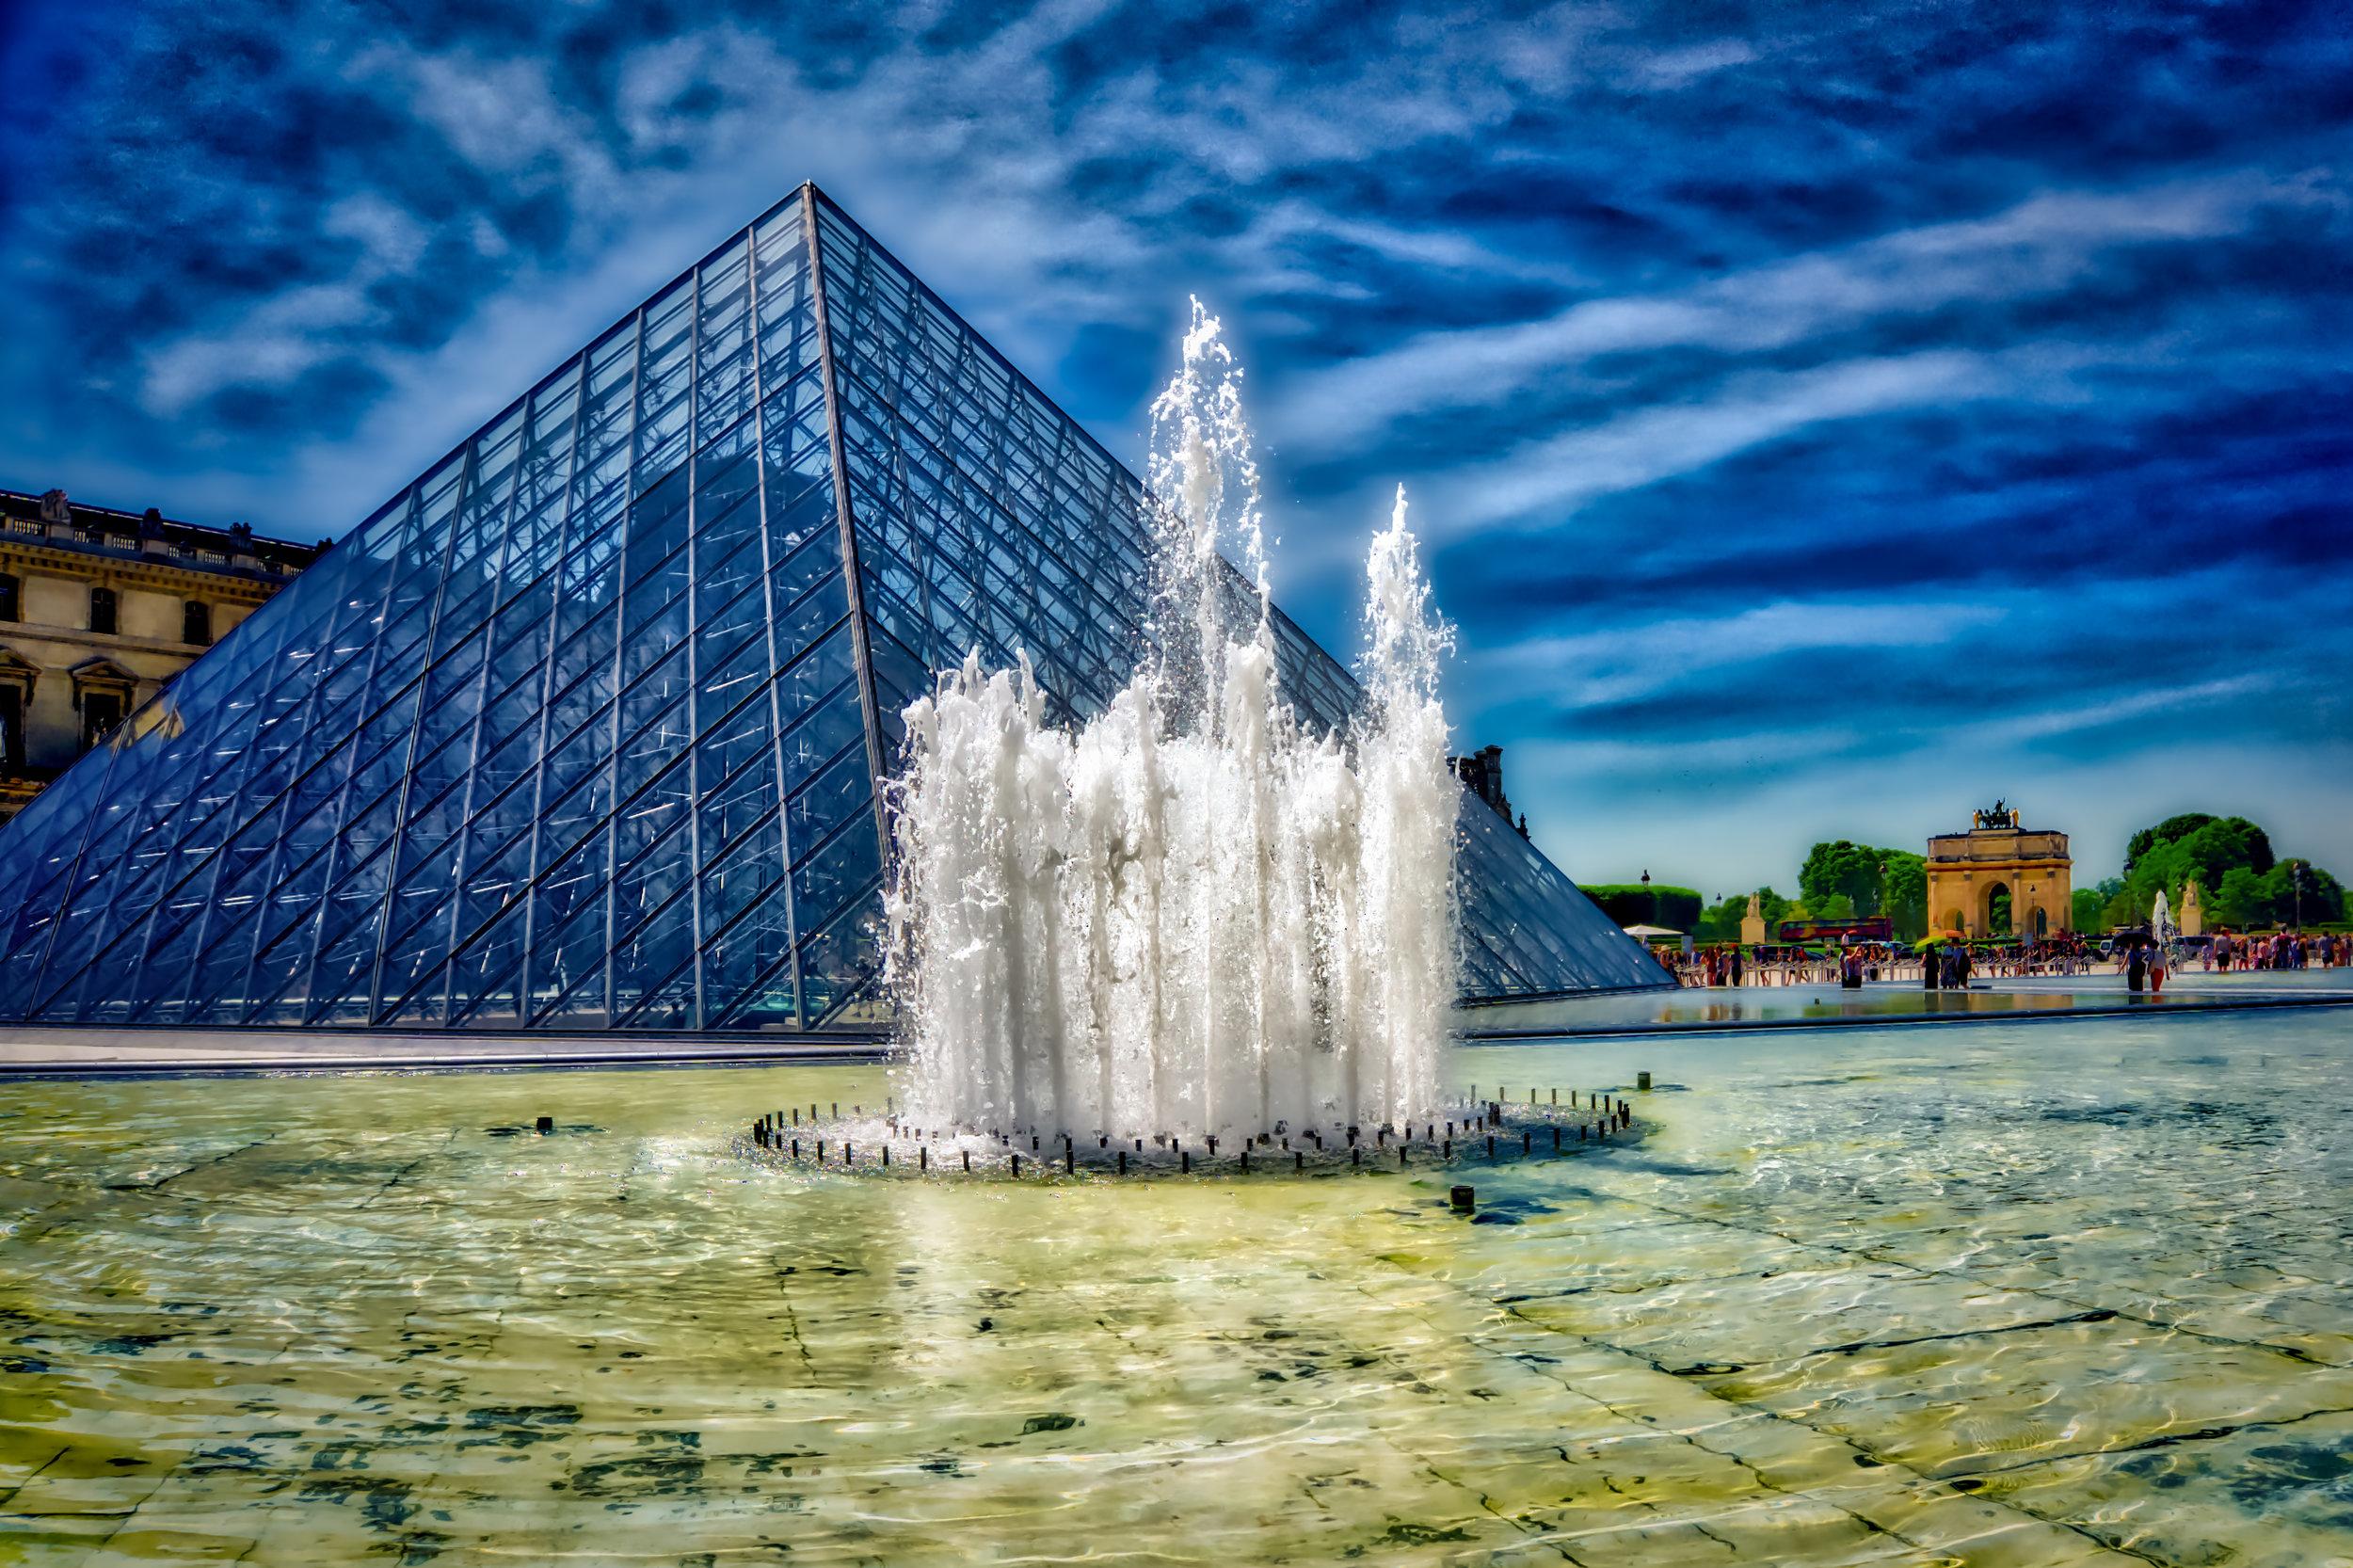 2017-06-19 Paris The Louvre00160.jpg